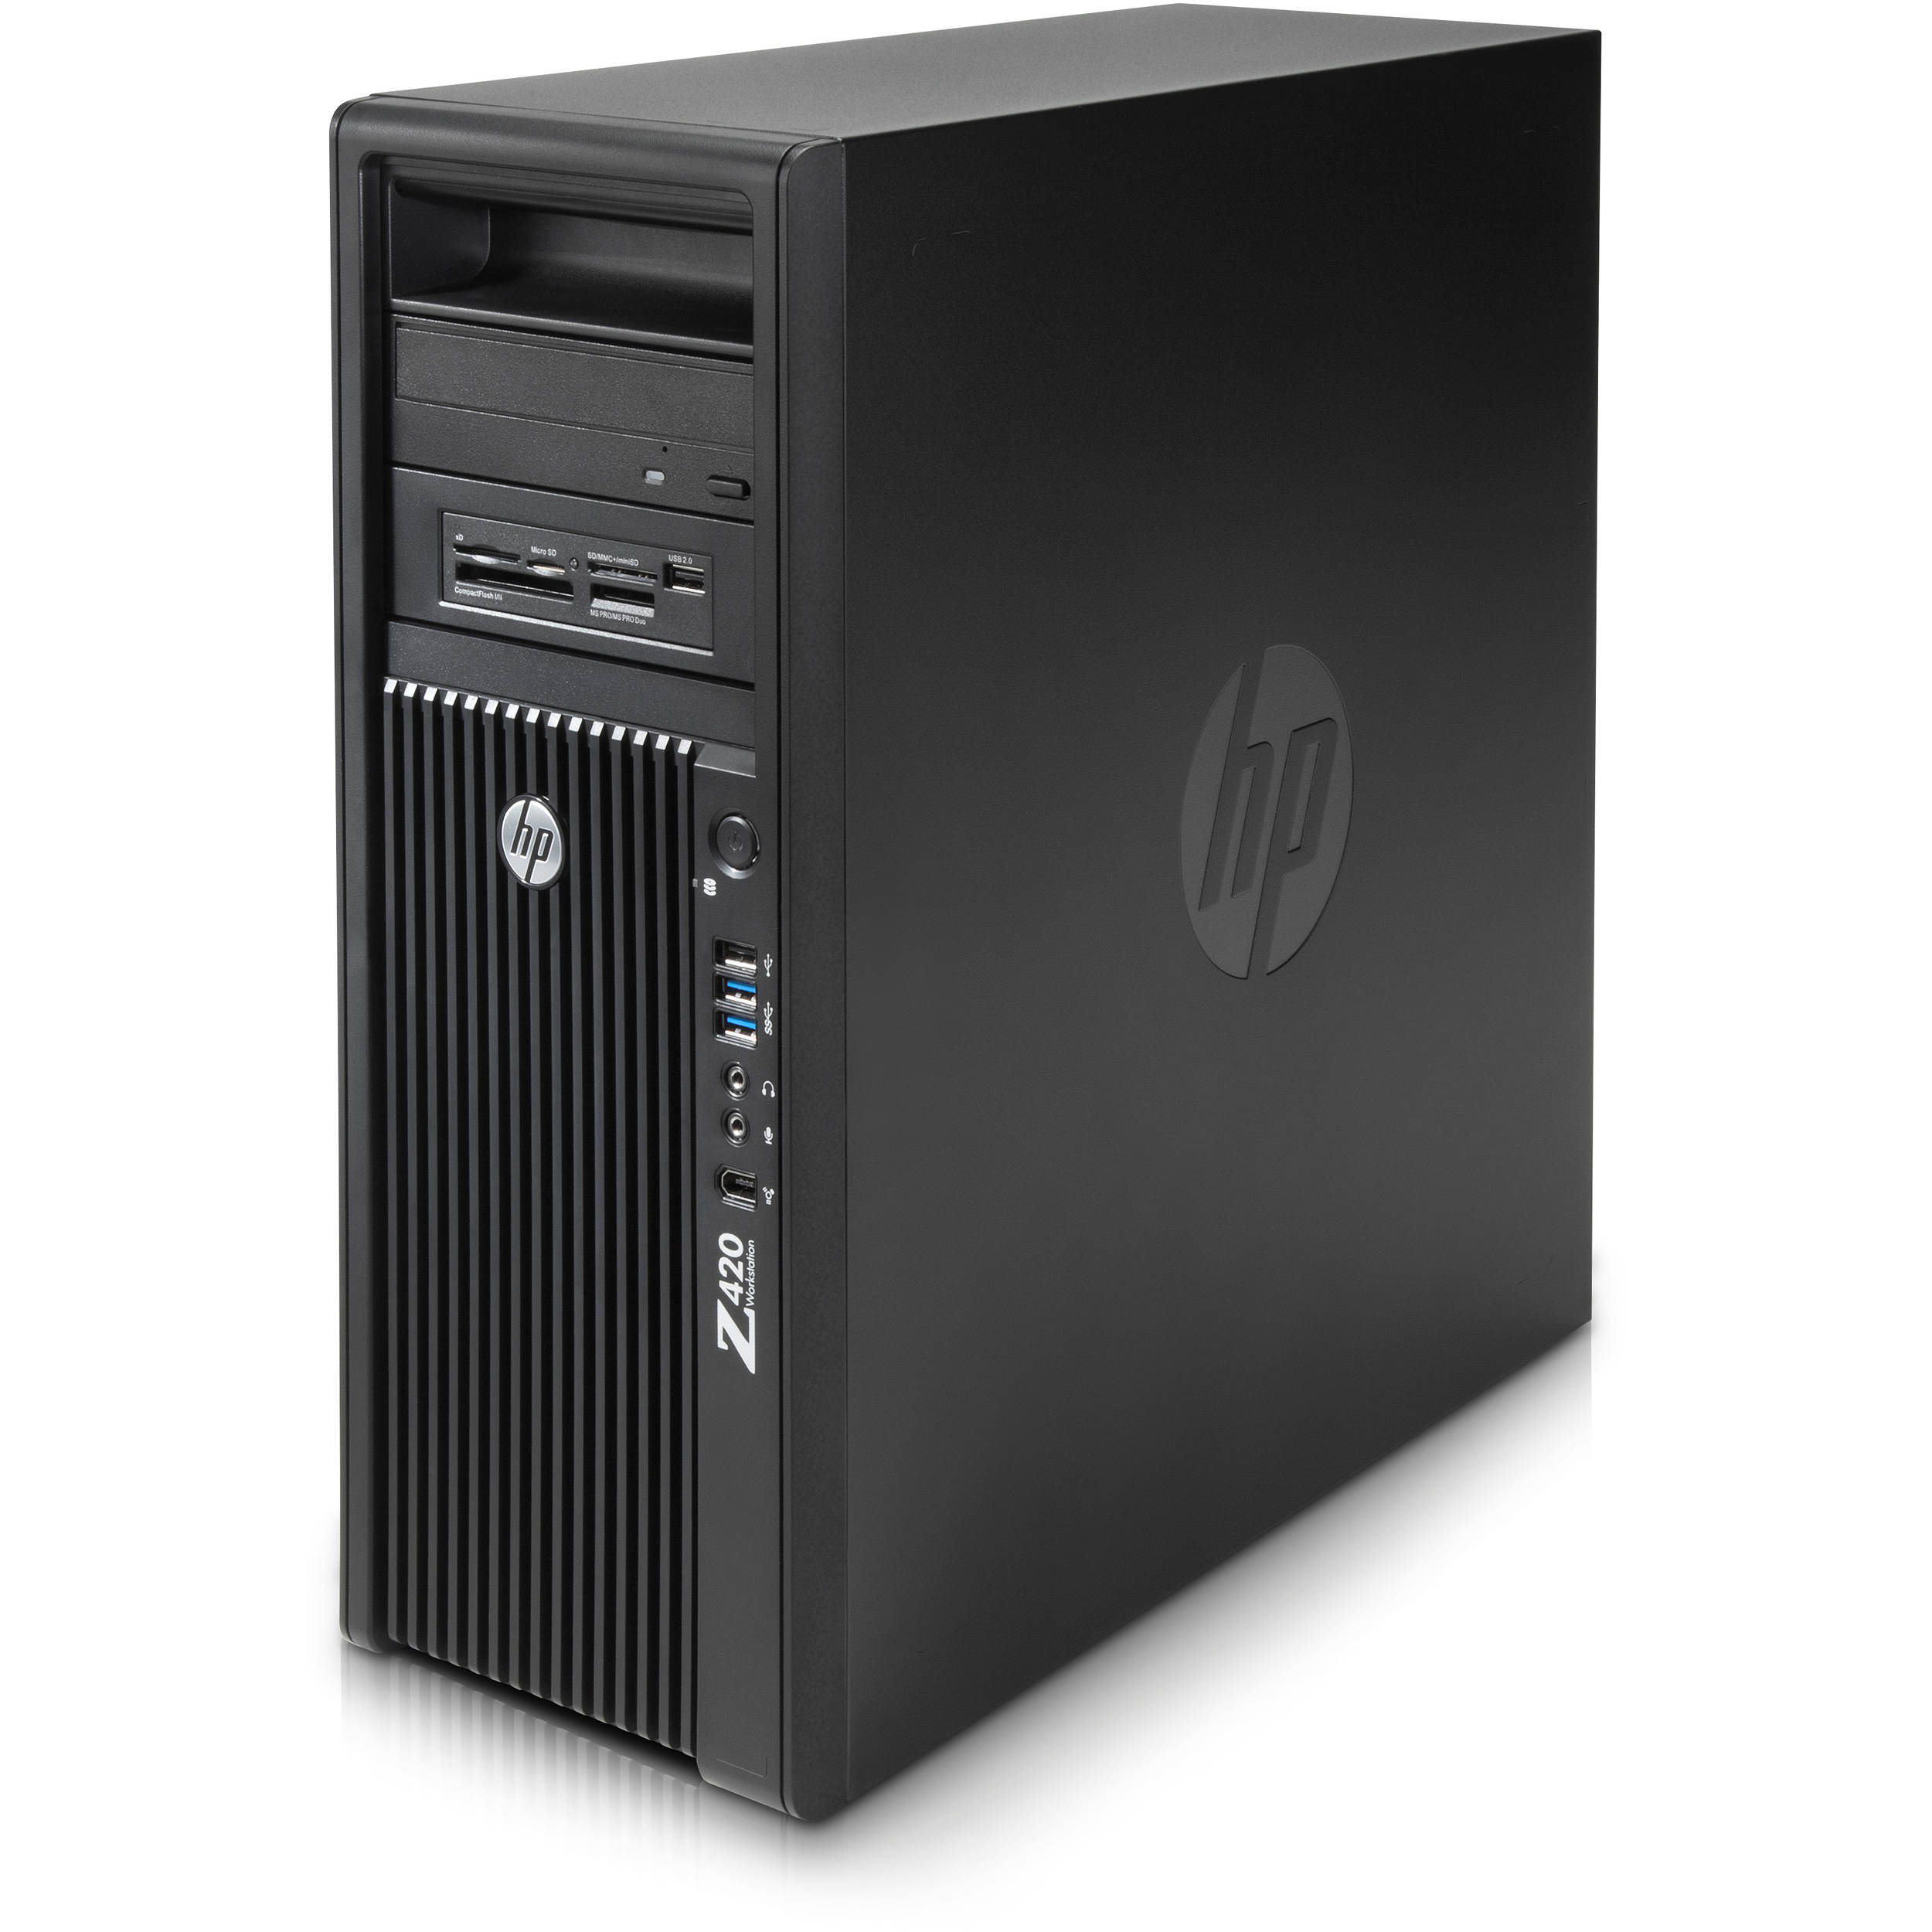 HP Z420 Series B2B96UT Workstation Computer